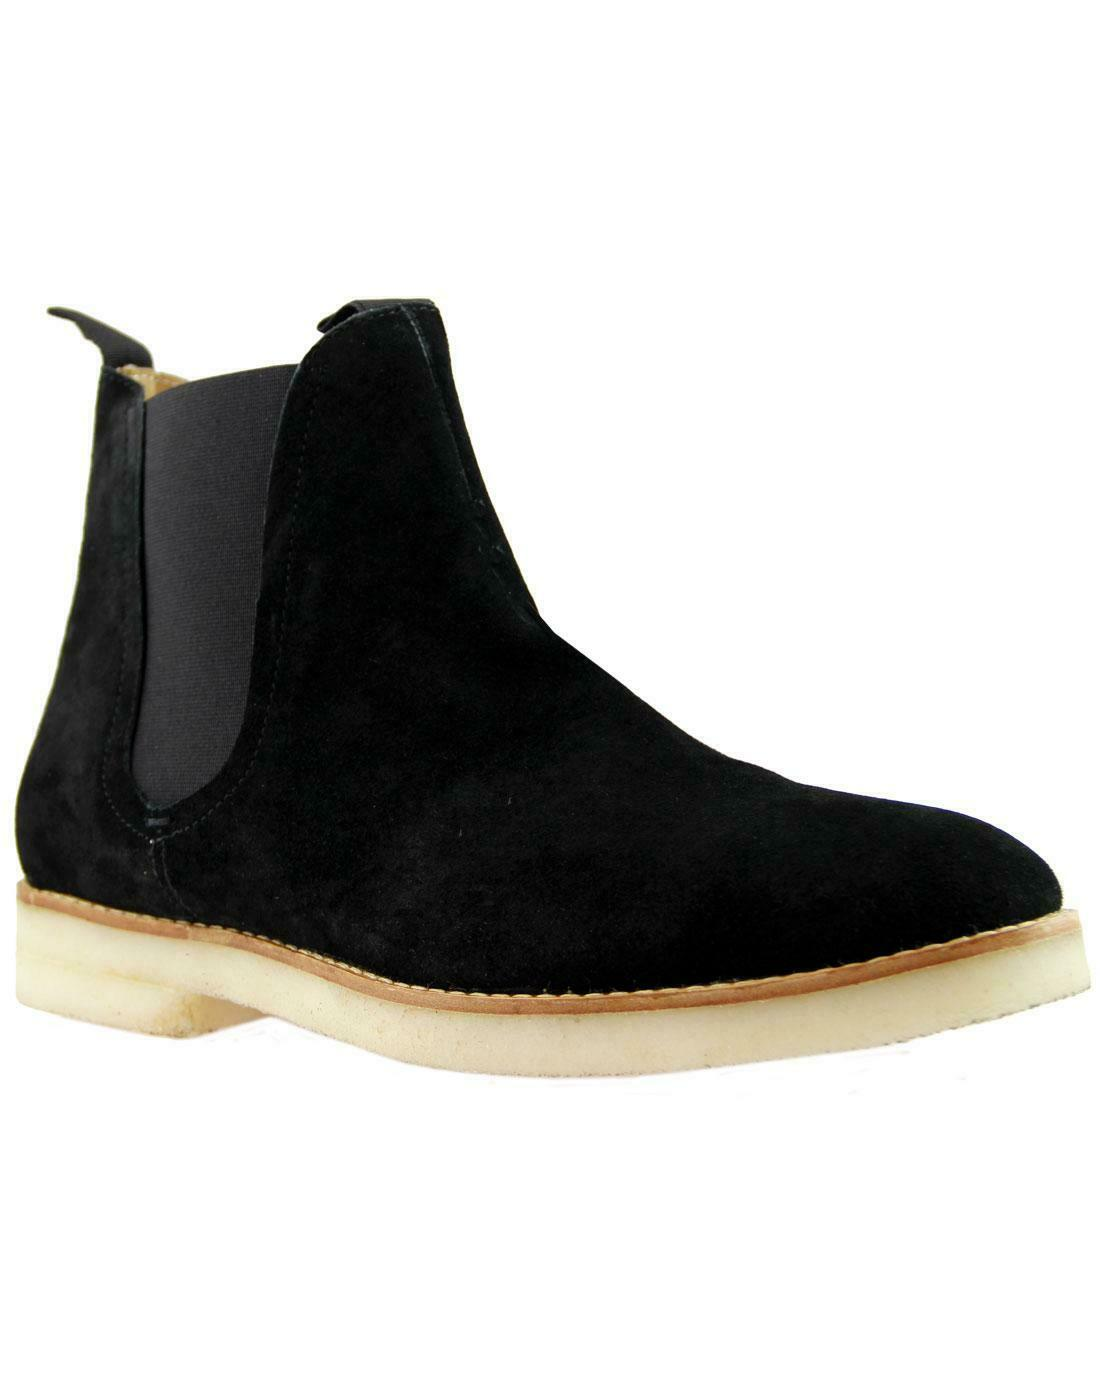 H by Hudson Negro Cuero Zapatos de gamuza tobillo Sandgate Chelsea botas 7 12 Nuevo